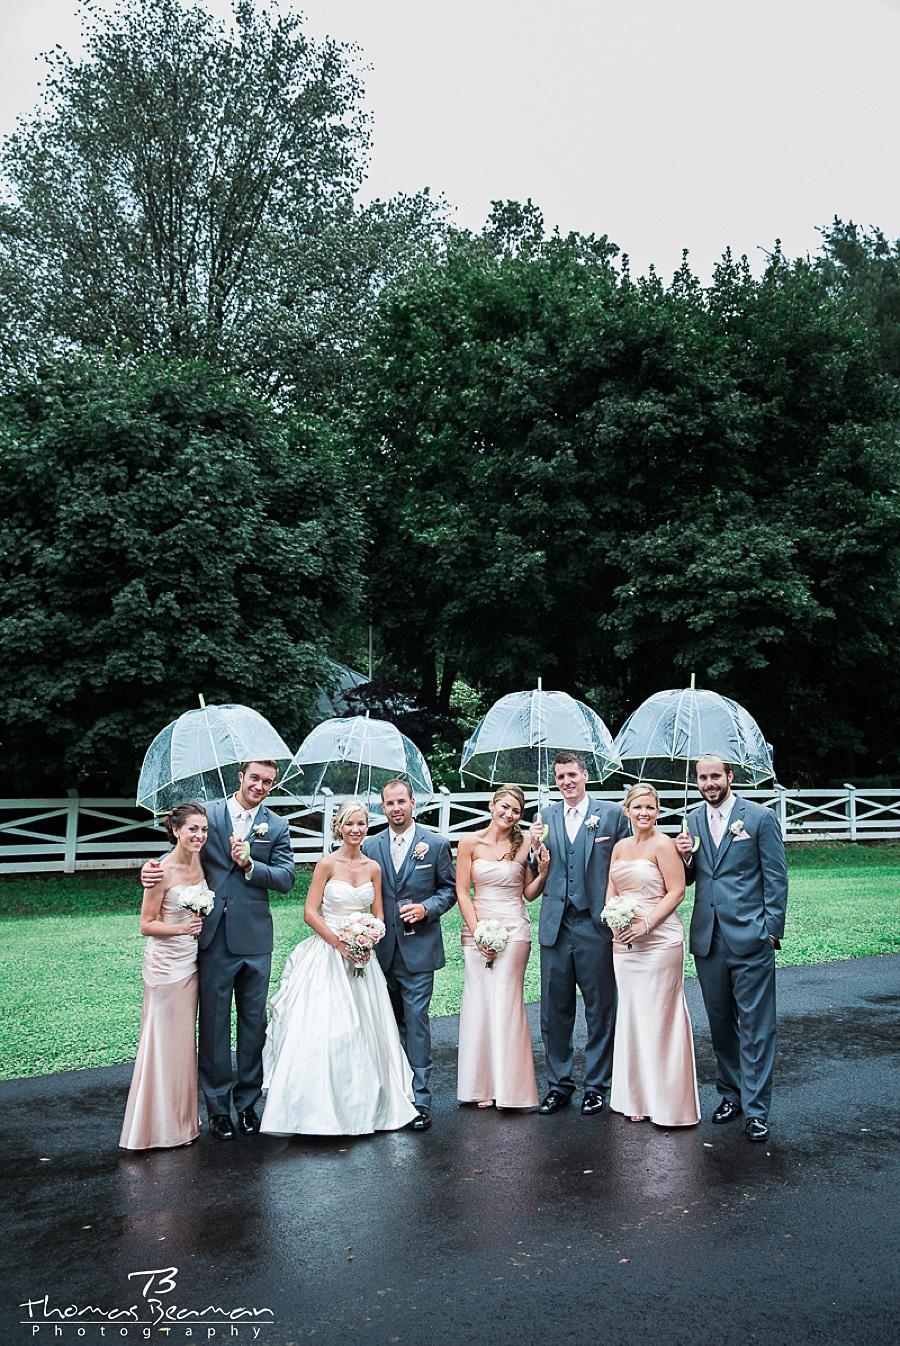 Thomas_beaman_wedding_best_of_2015_photo-47